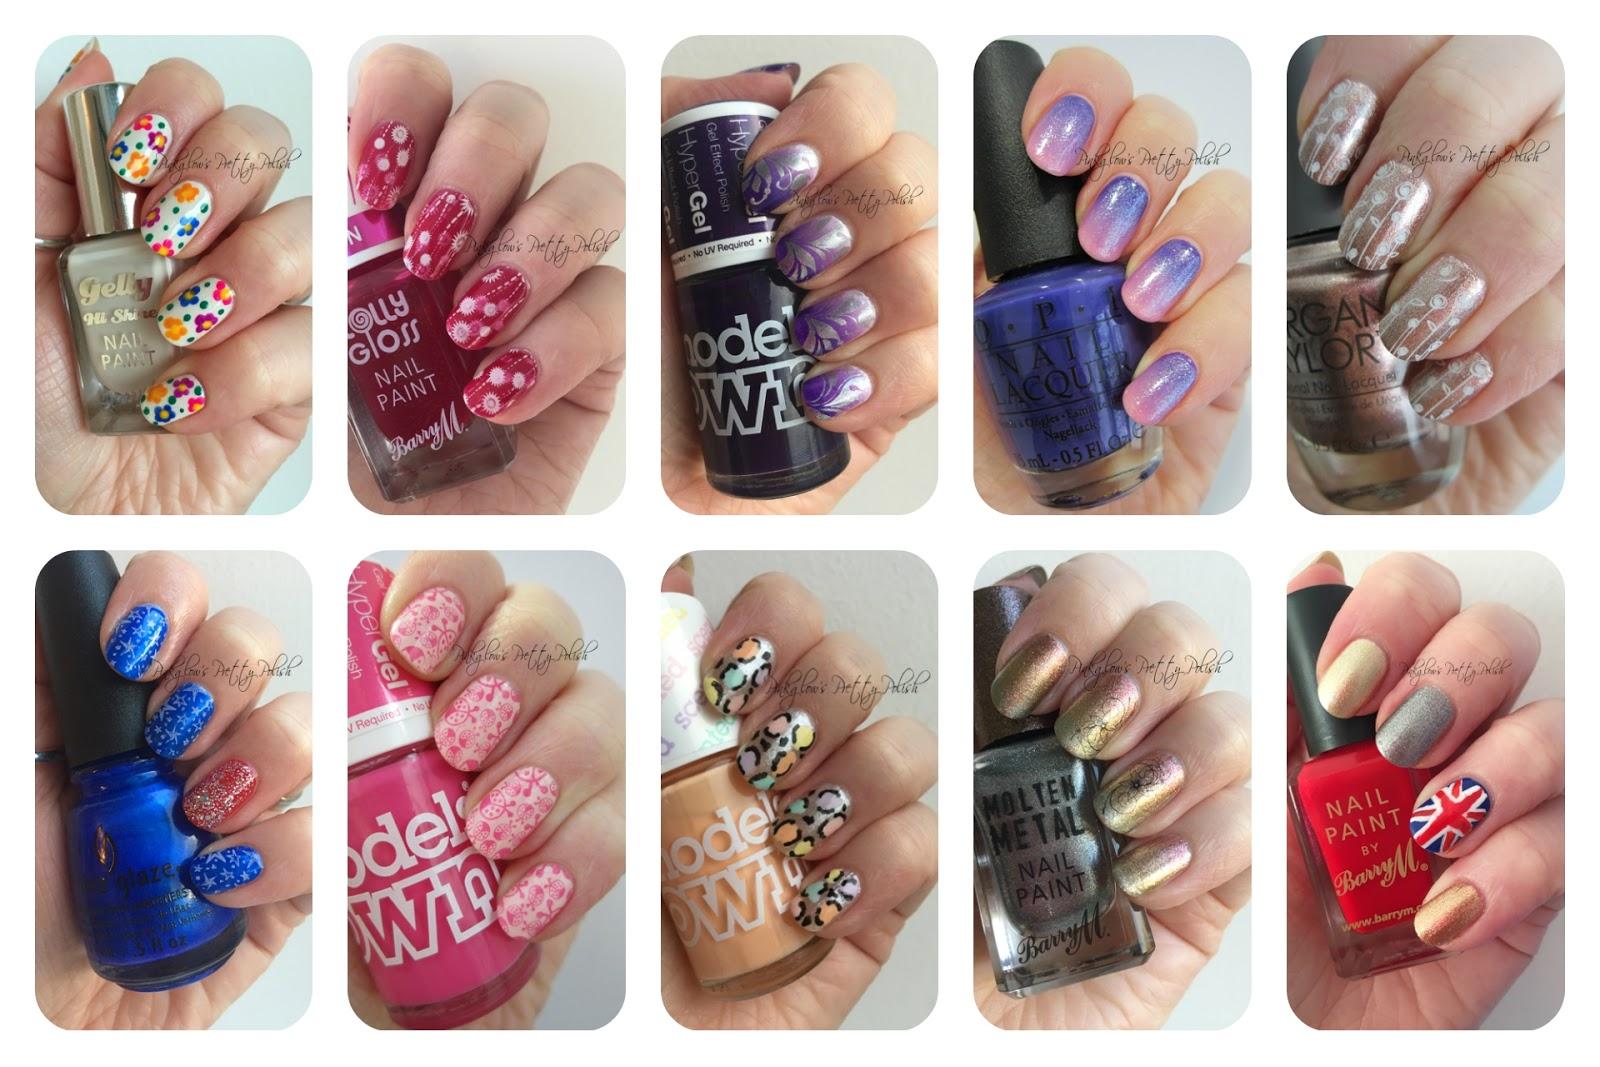 Pinkglows Pretty Polish Uk Nail Art Blog Back From A Blogging Break